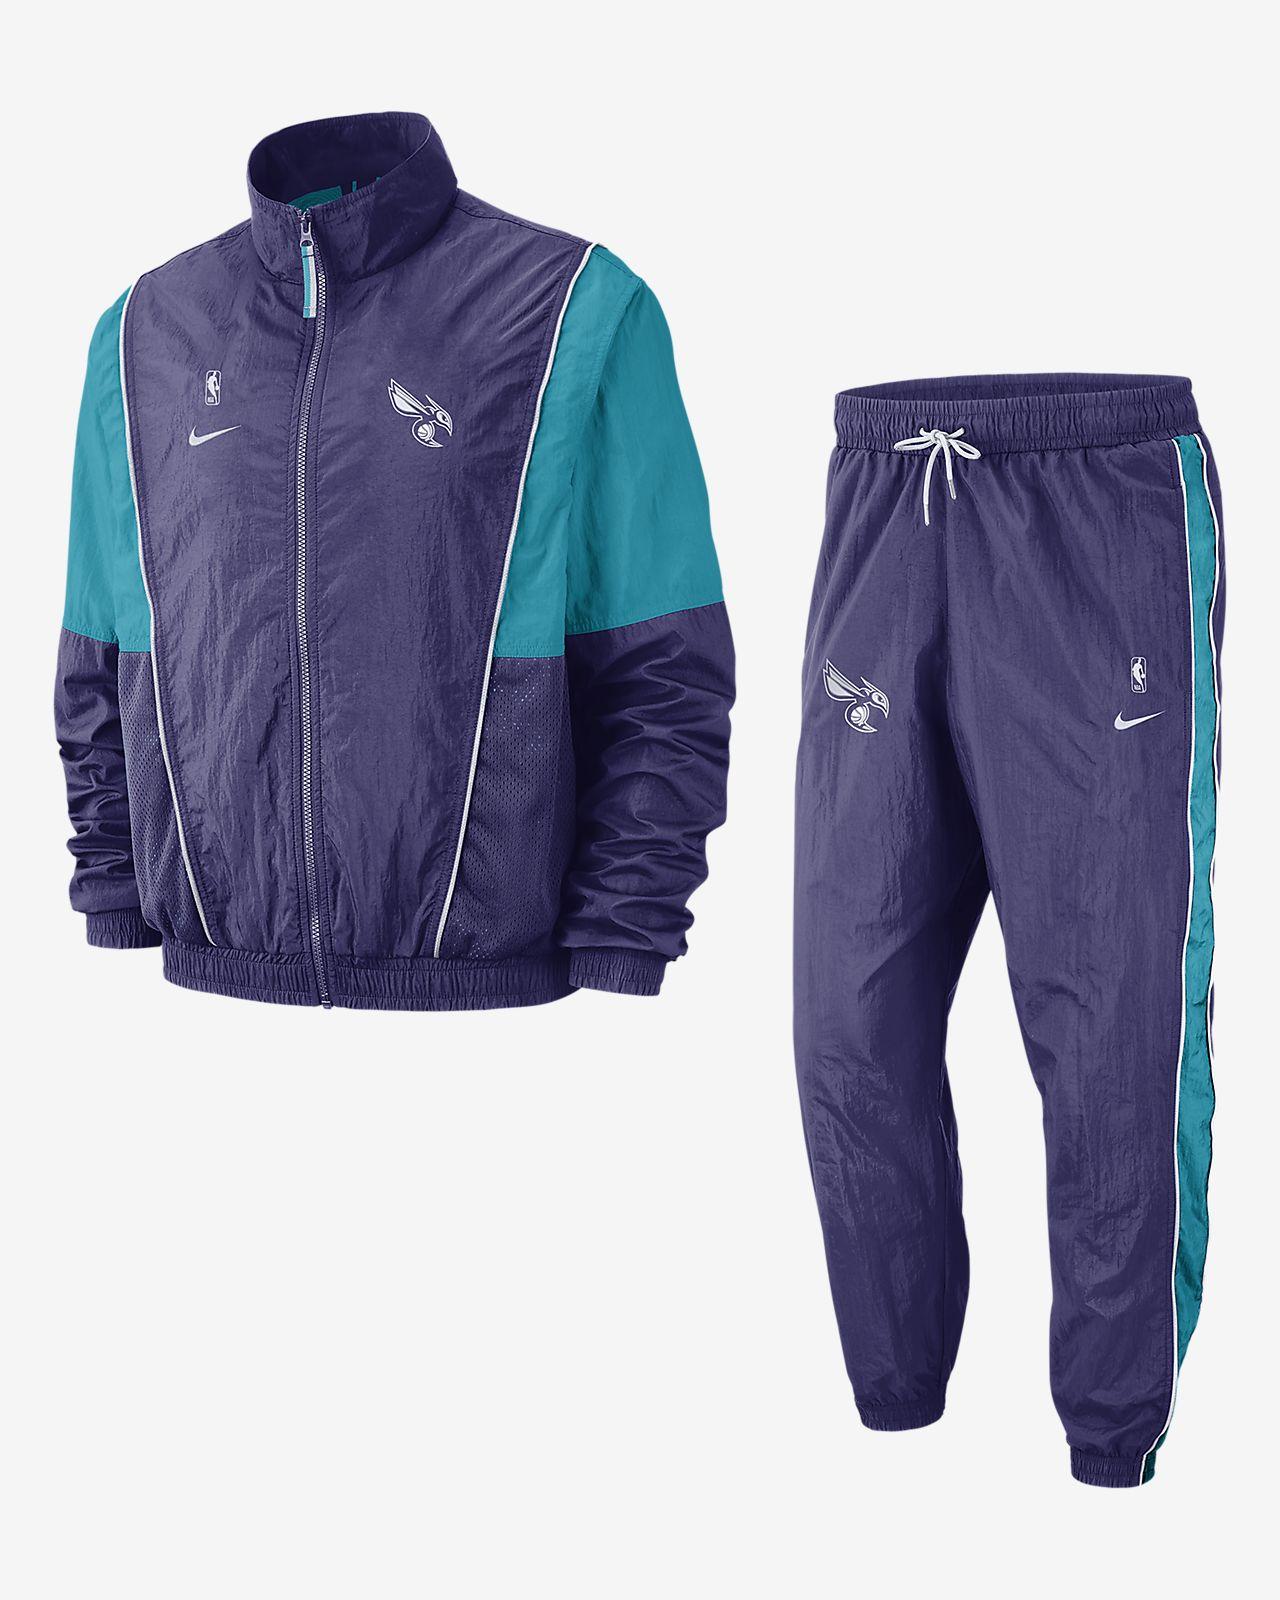 Charlotte Hornets Nike NBA-Trainingsanzug für Herren